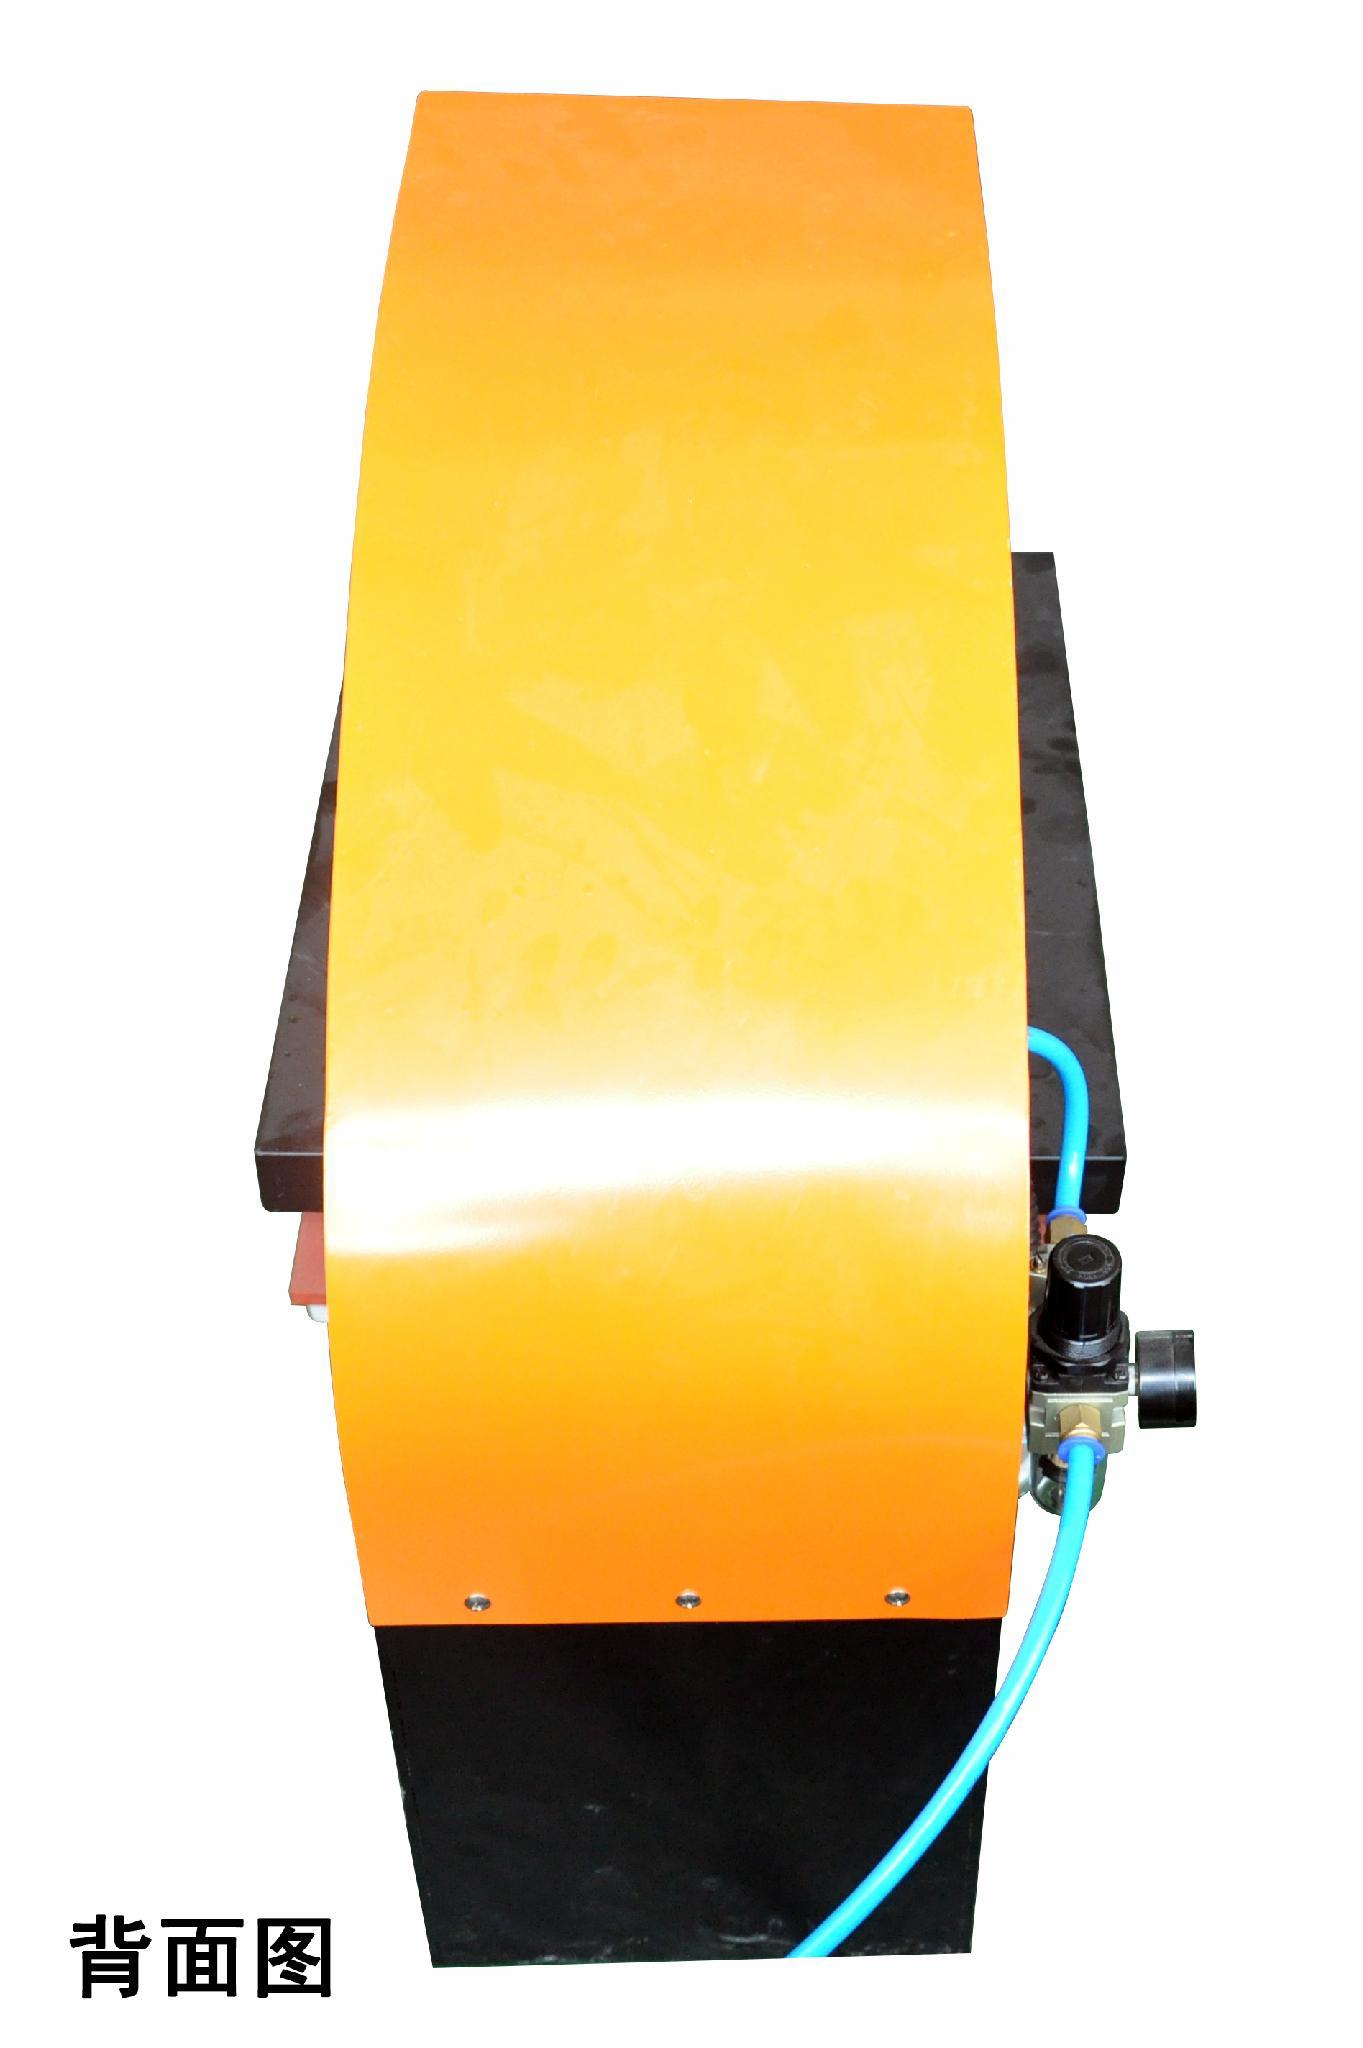 60*80cm YXD-A8 air operated single station heat press machine  11